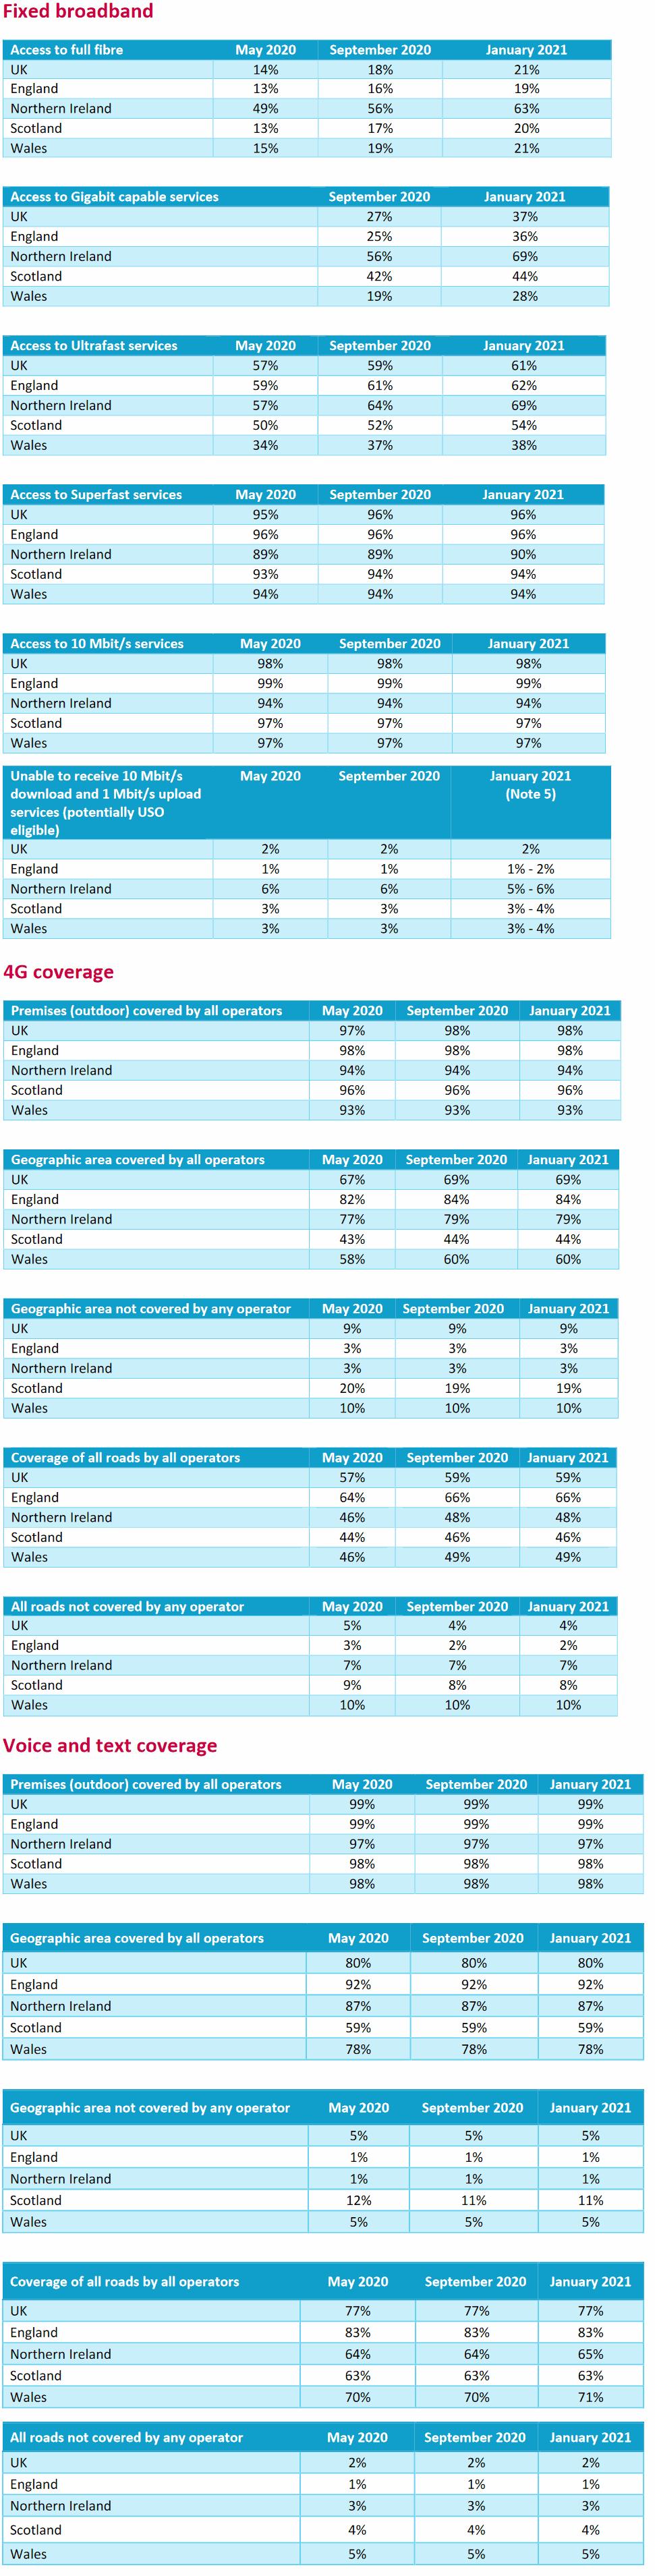 ofcom_spring_2021_uk_broadband_and_mobile_coverage